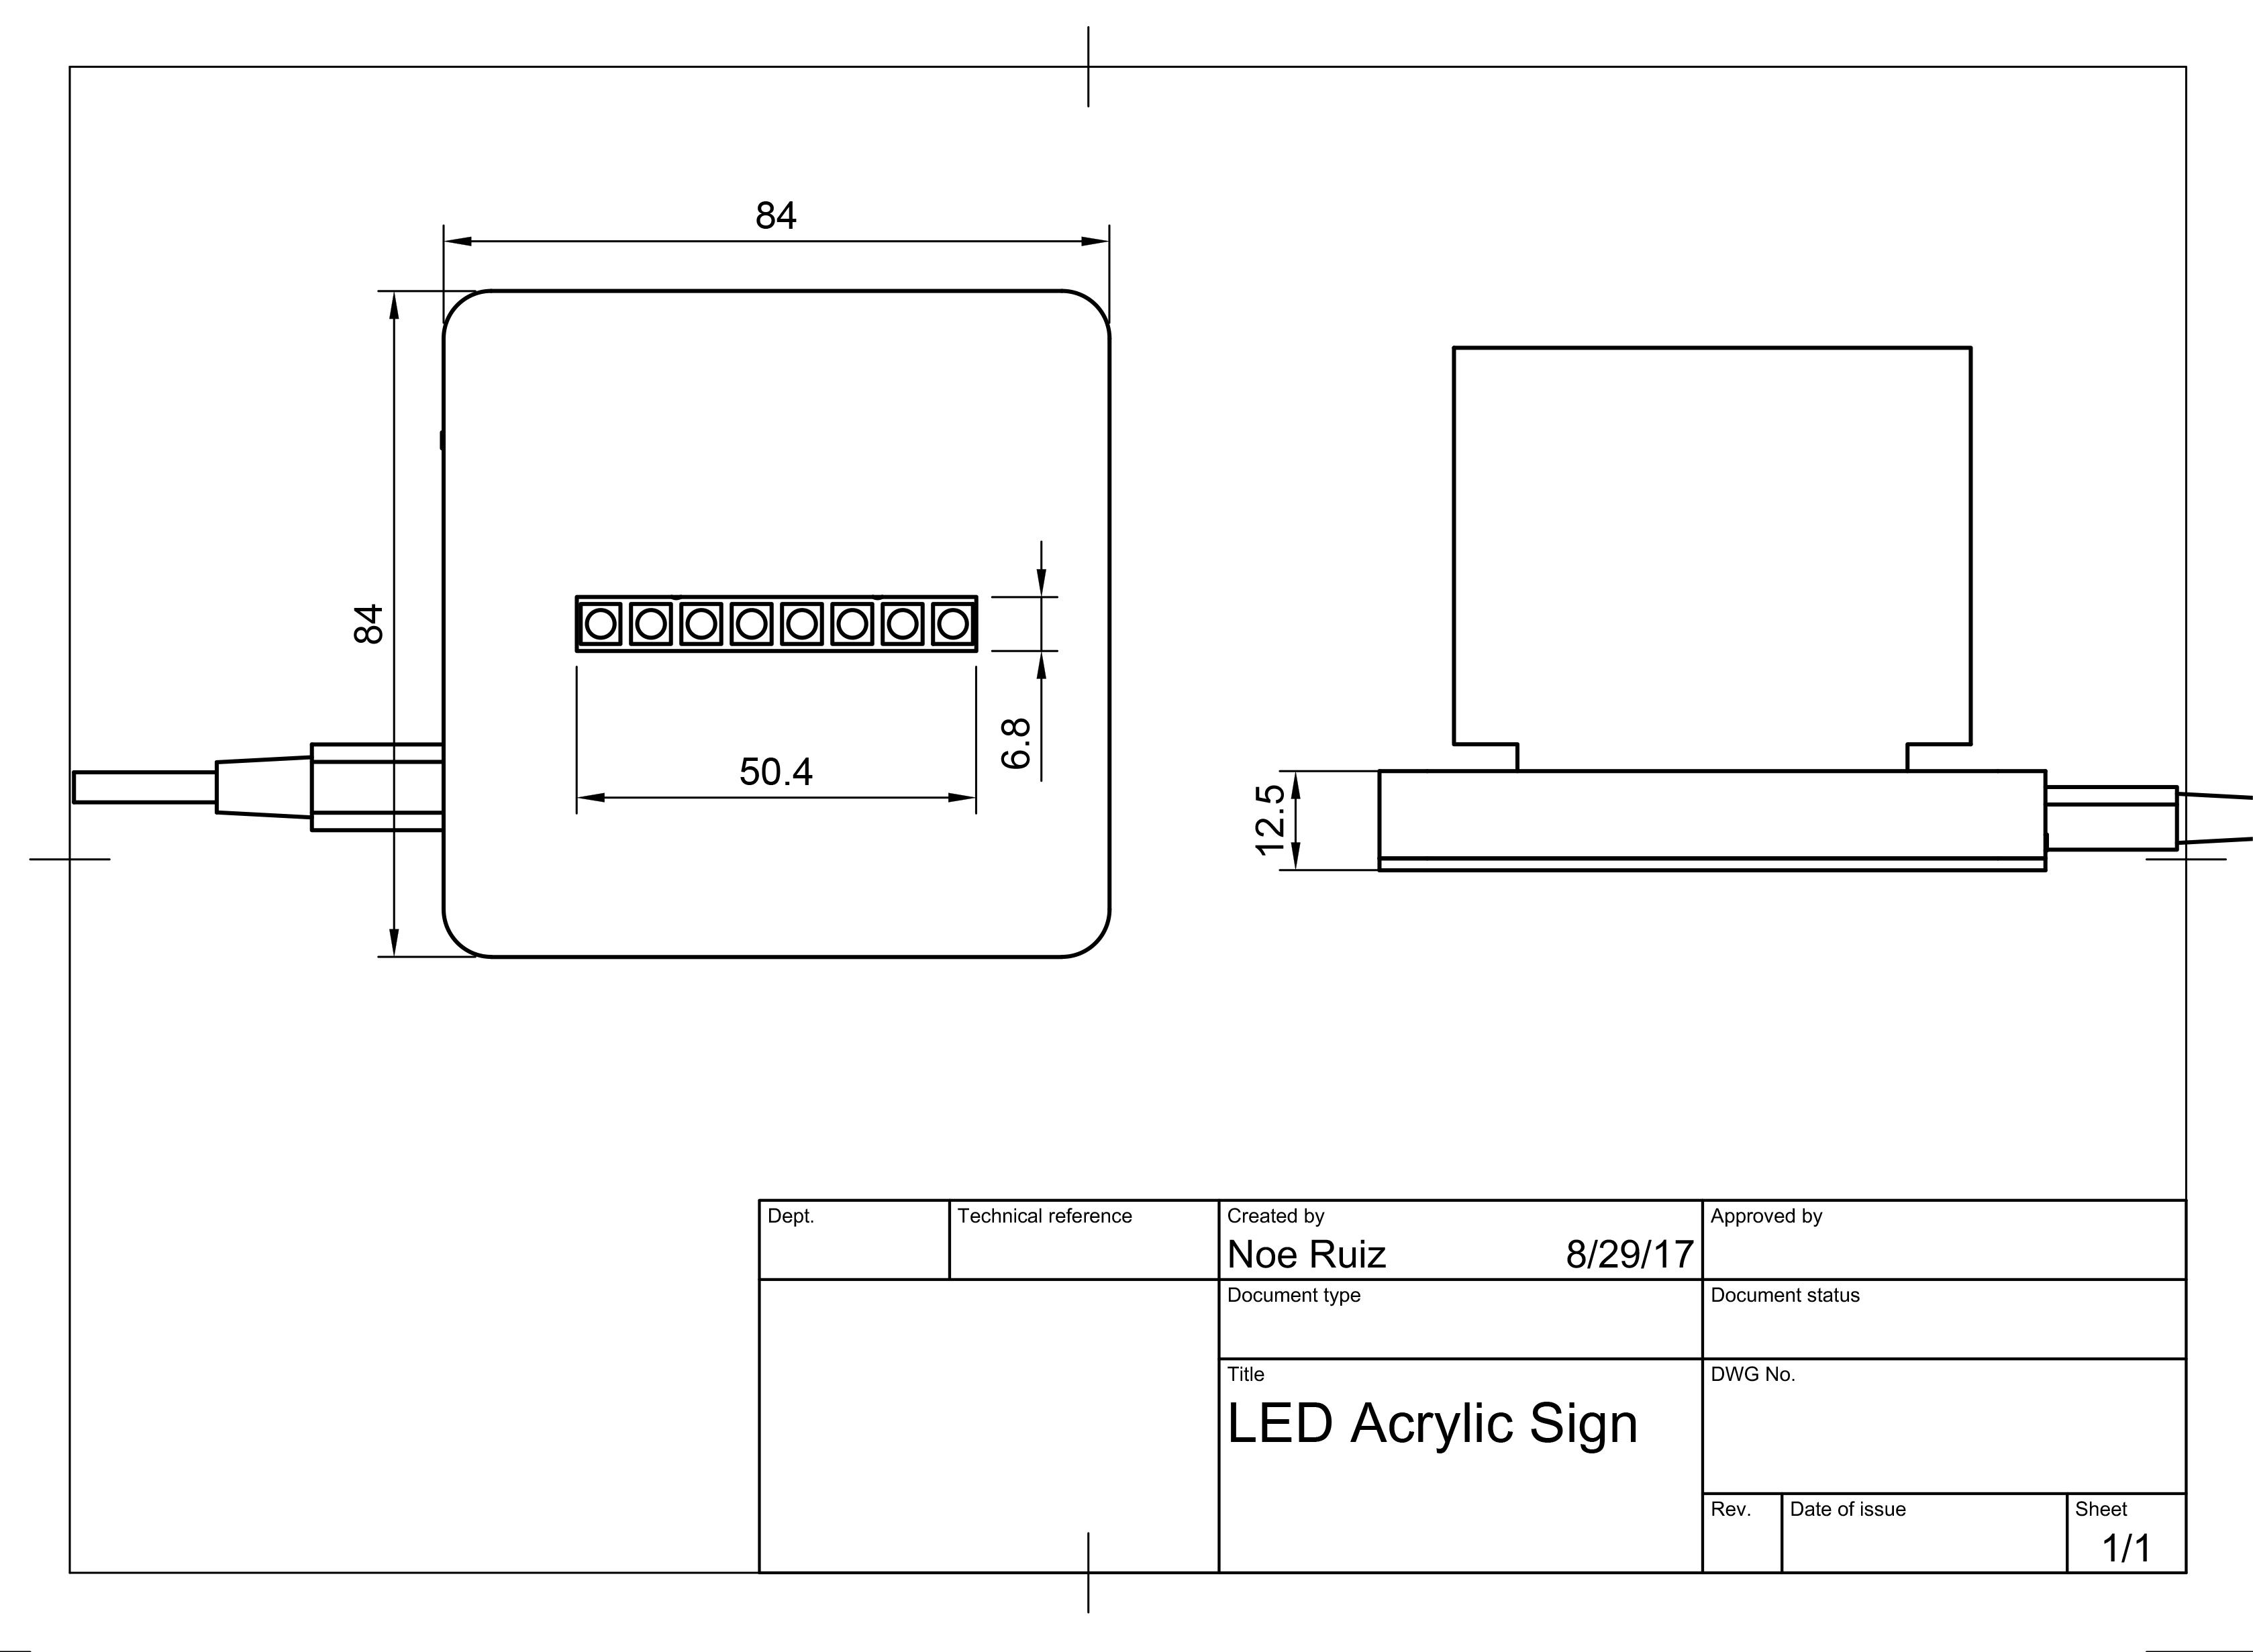 led_pixels_LED-Acrylic-Sign-Drawing-v1.png